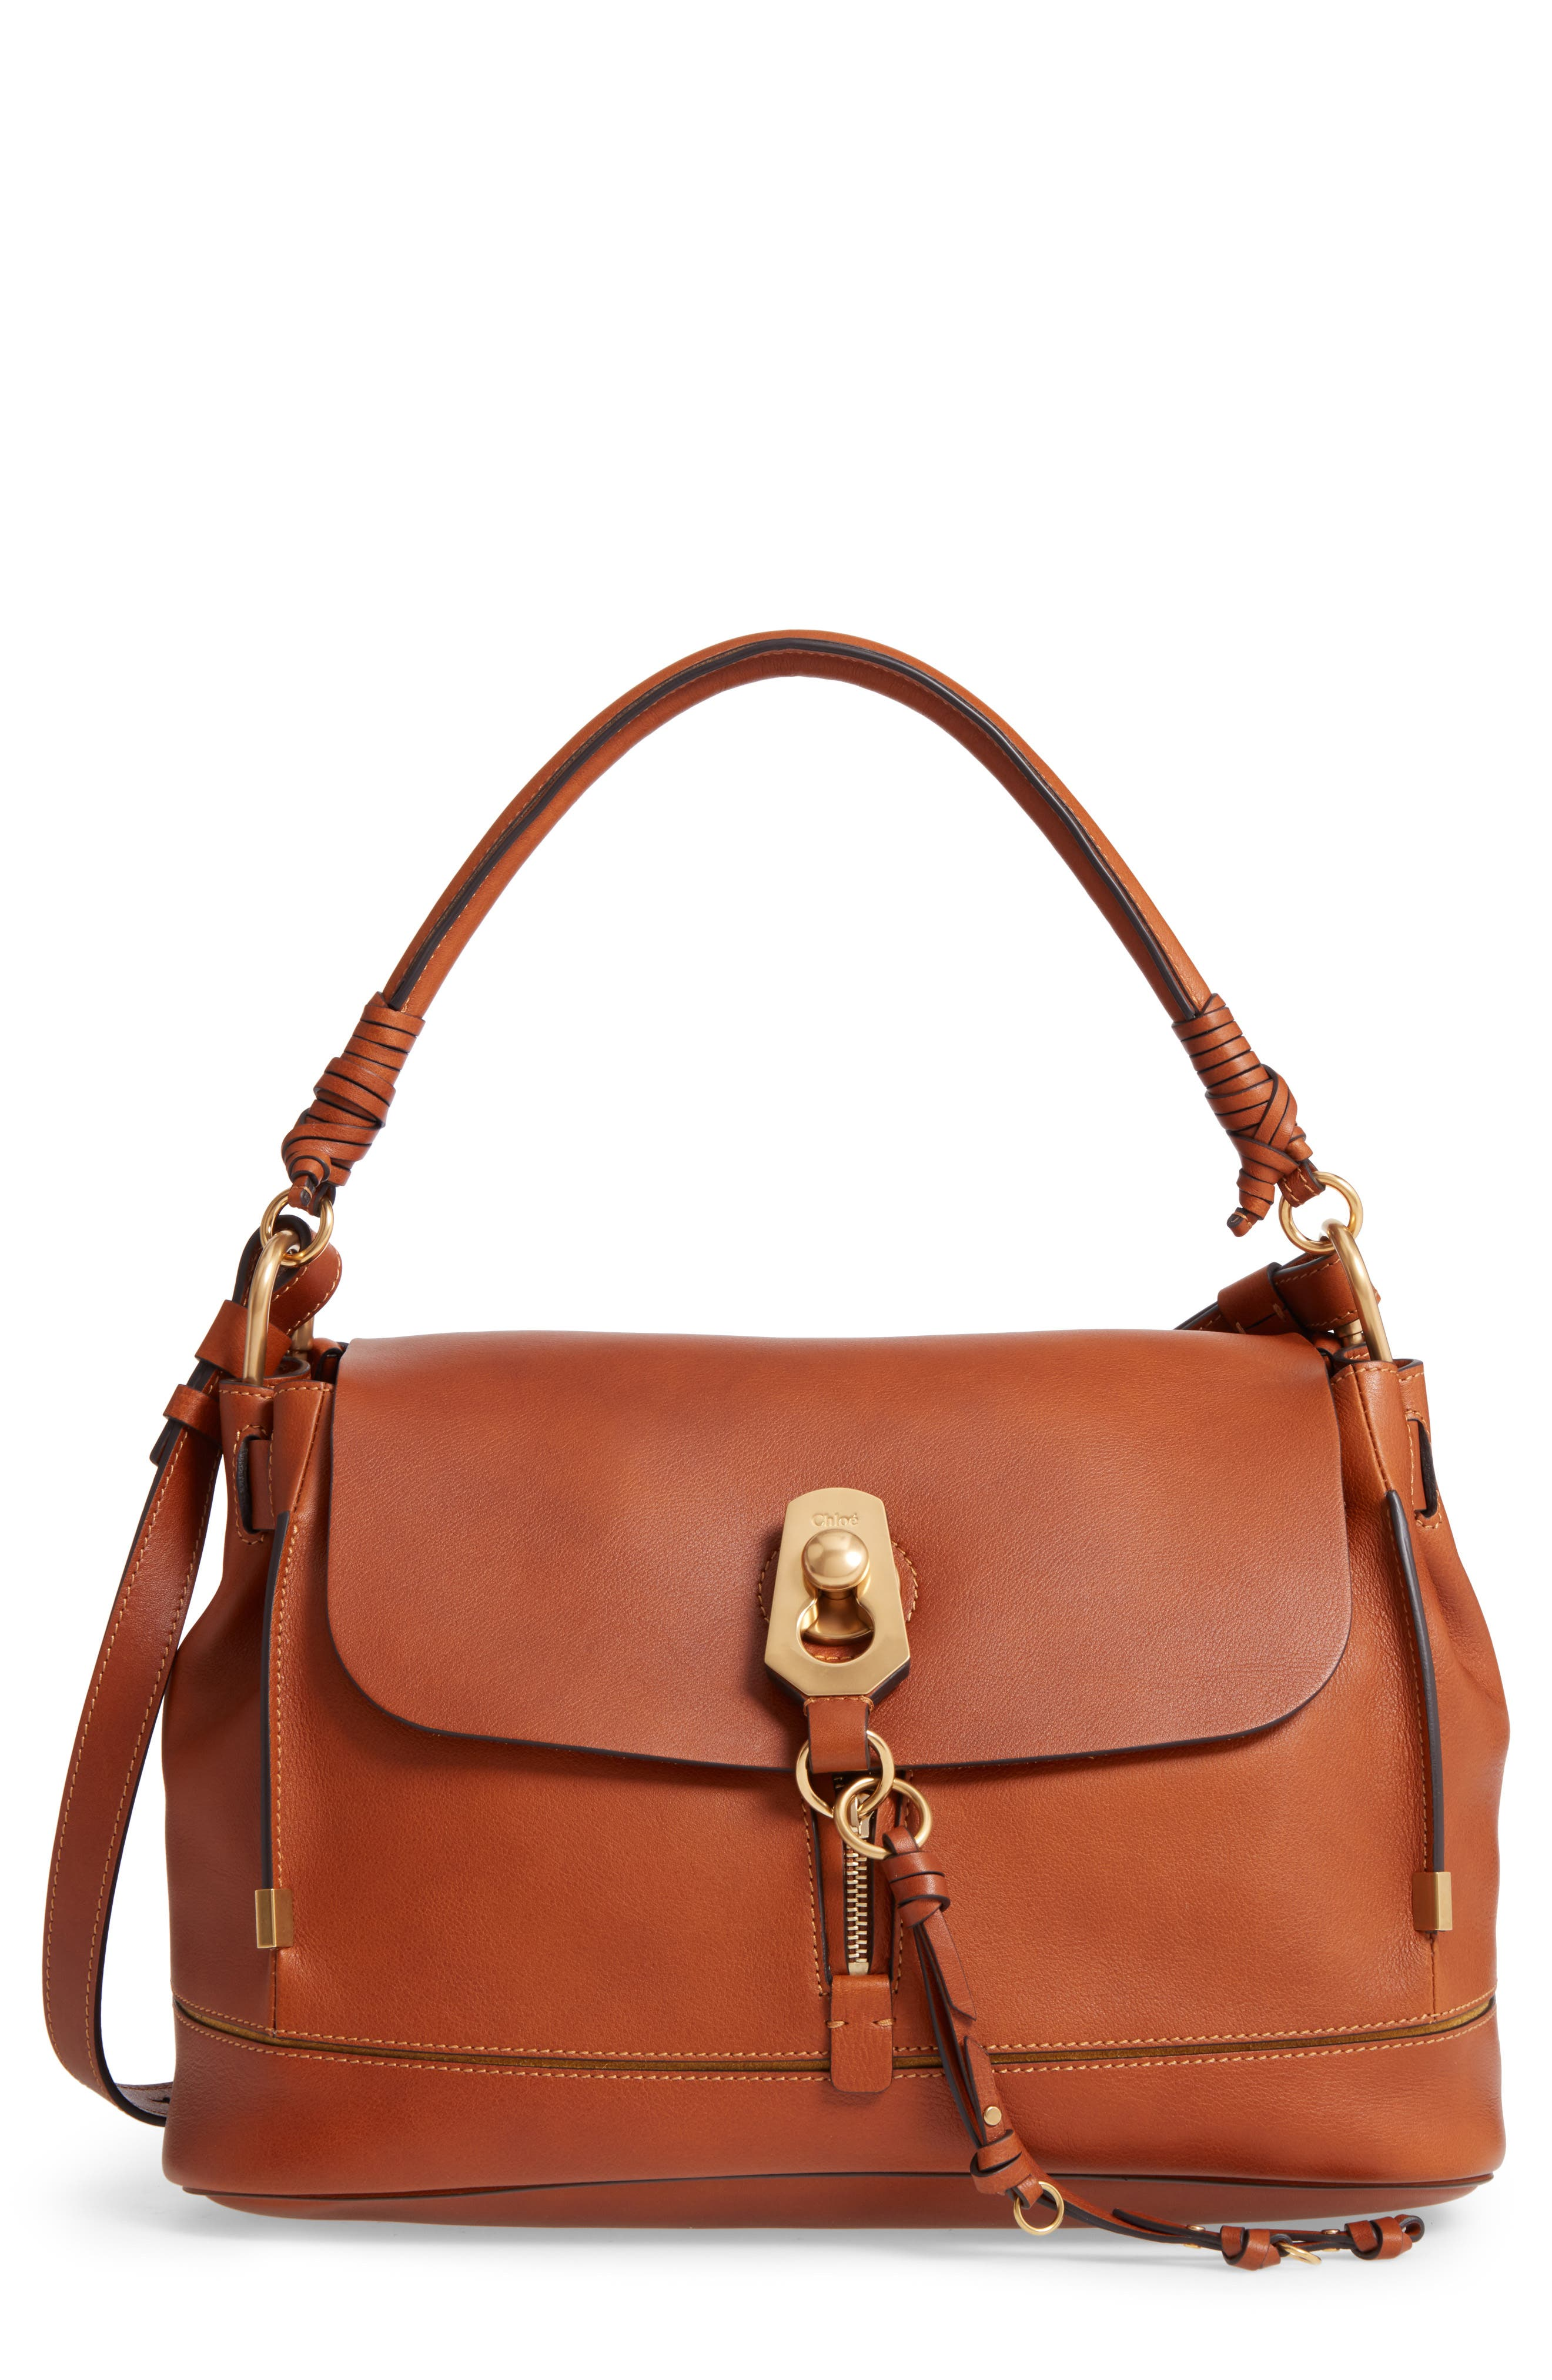 Chloé Medium Owen Calfskin Leather Satchel